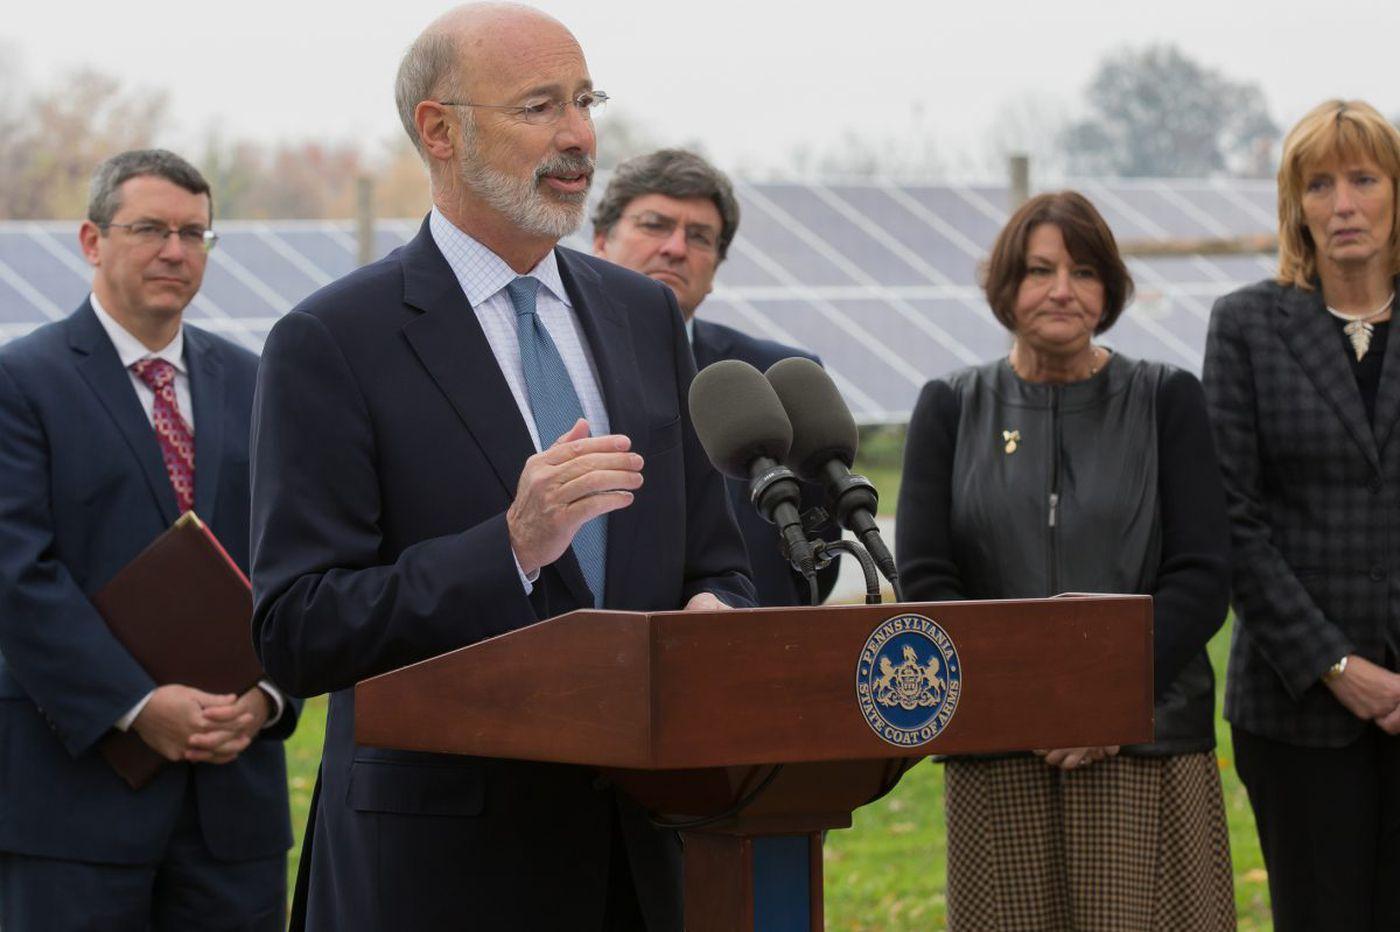 The outlook is sunny for solar jobs in Pennsylvania